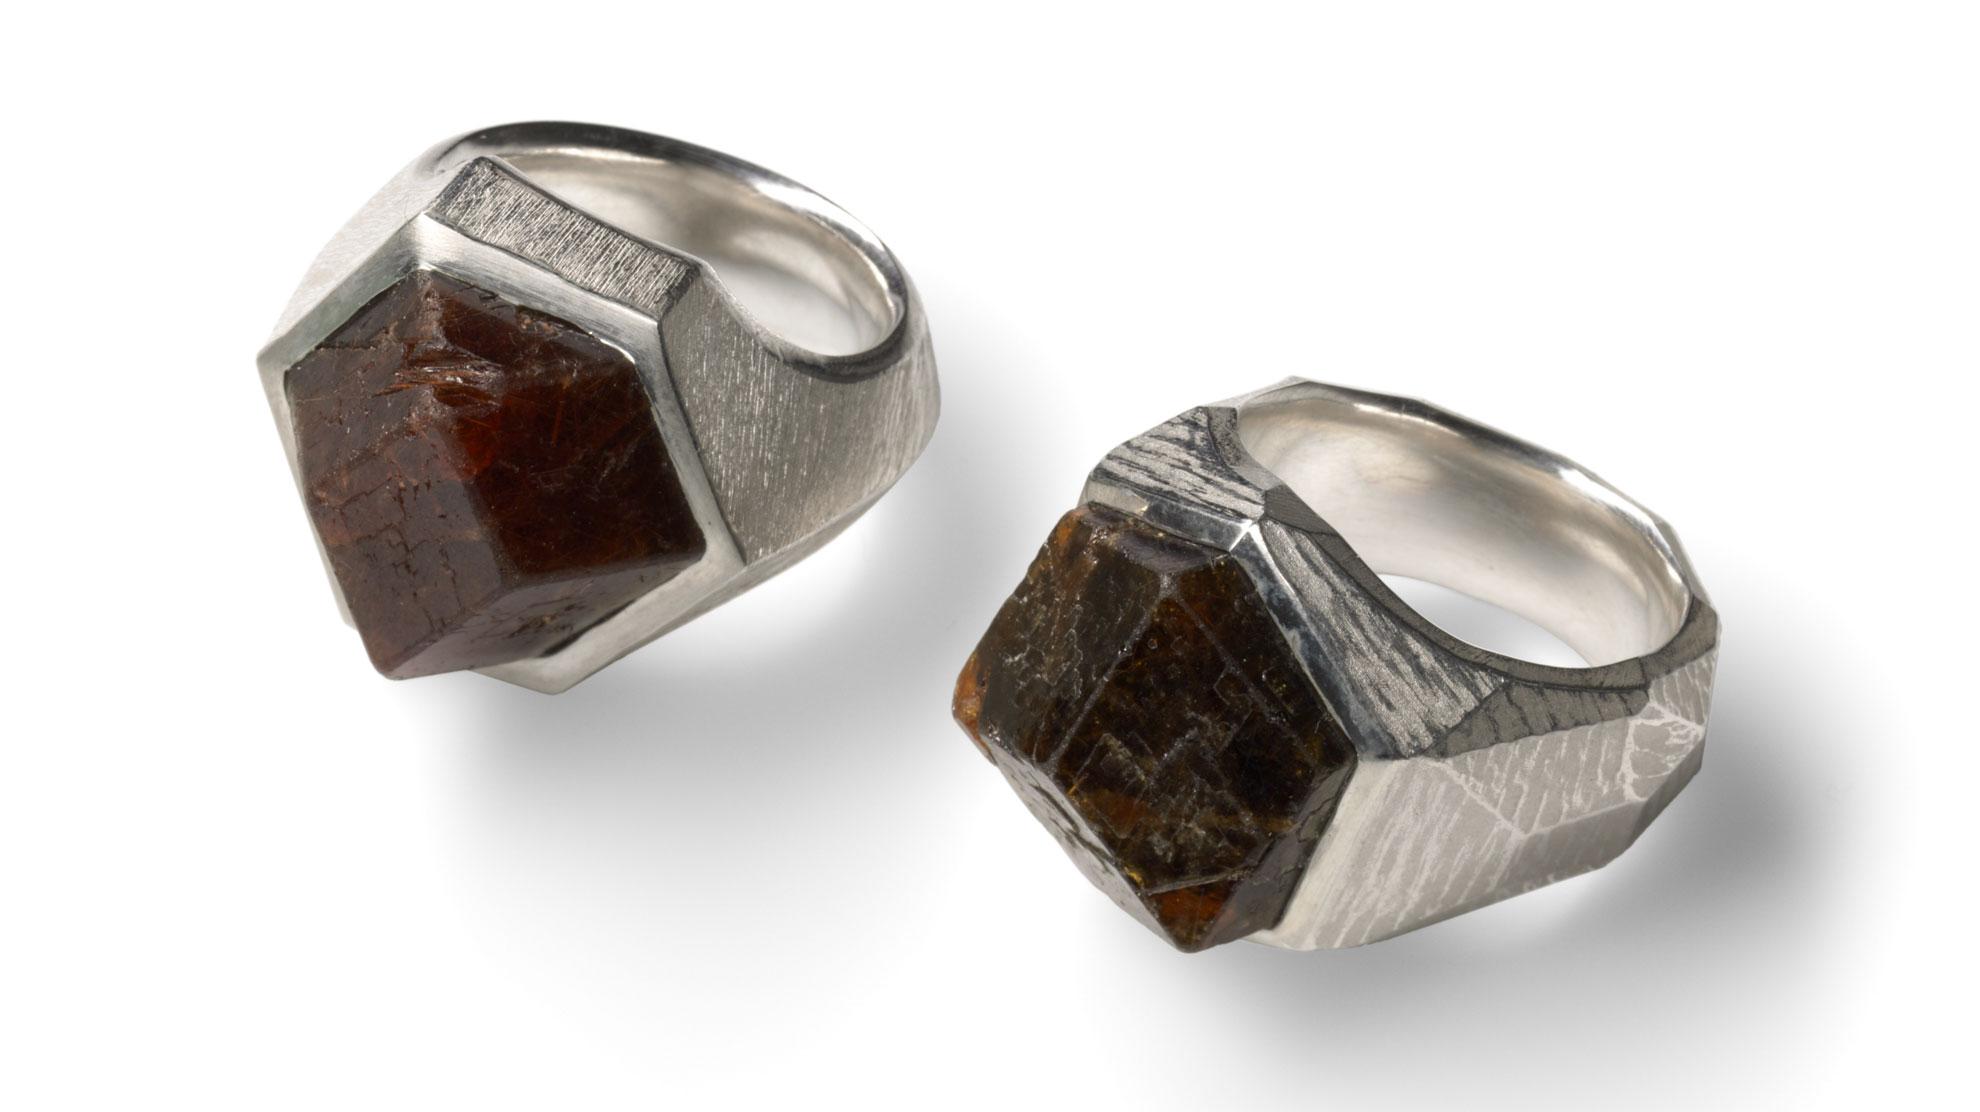 17 Ringe Rohgranat 925 Silber, natürlicher Granatkristall